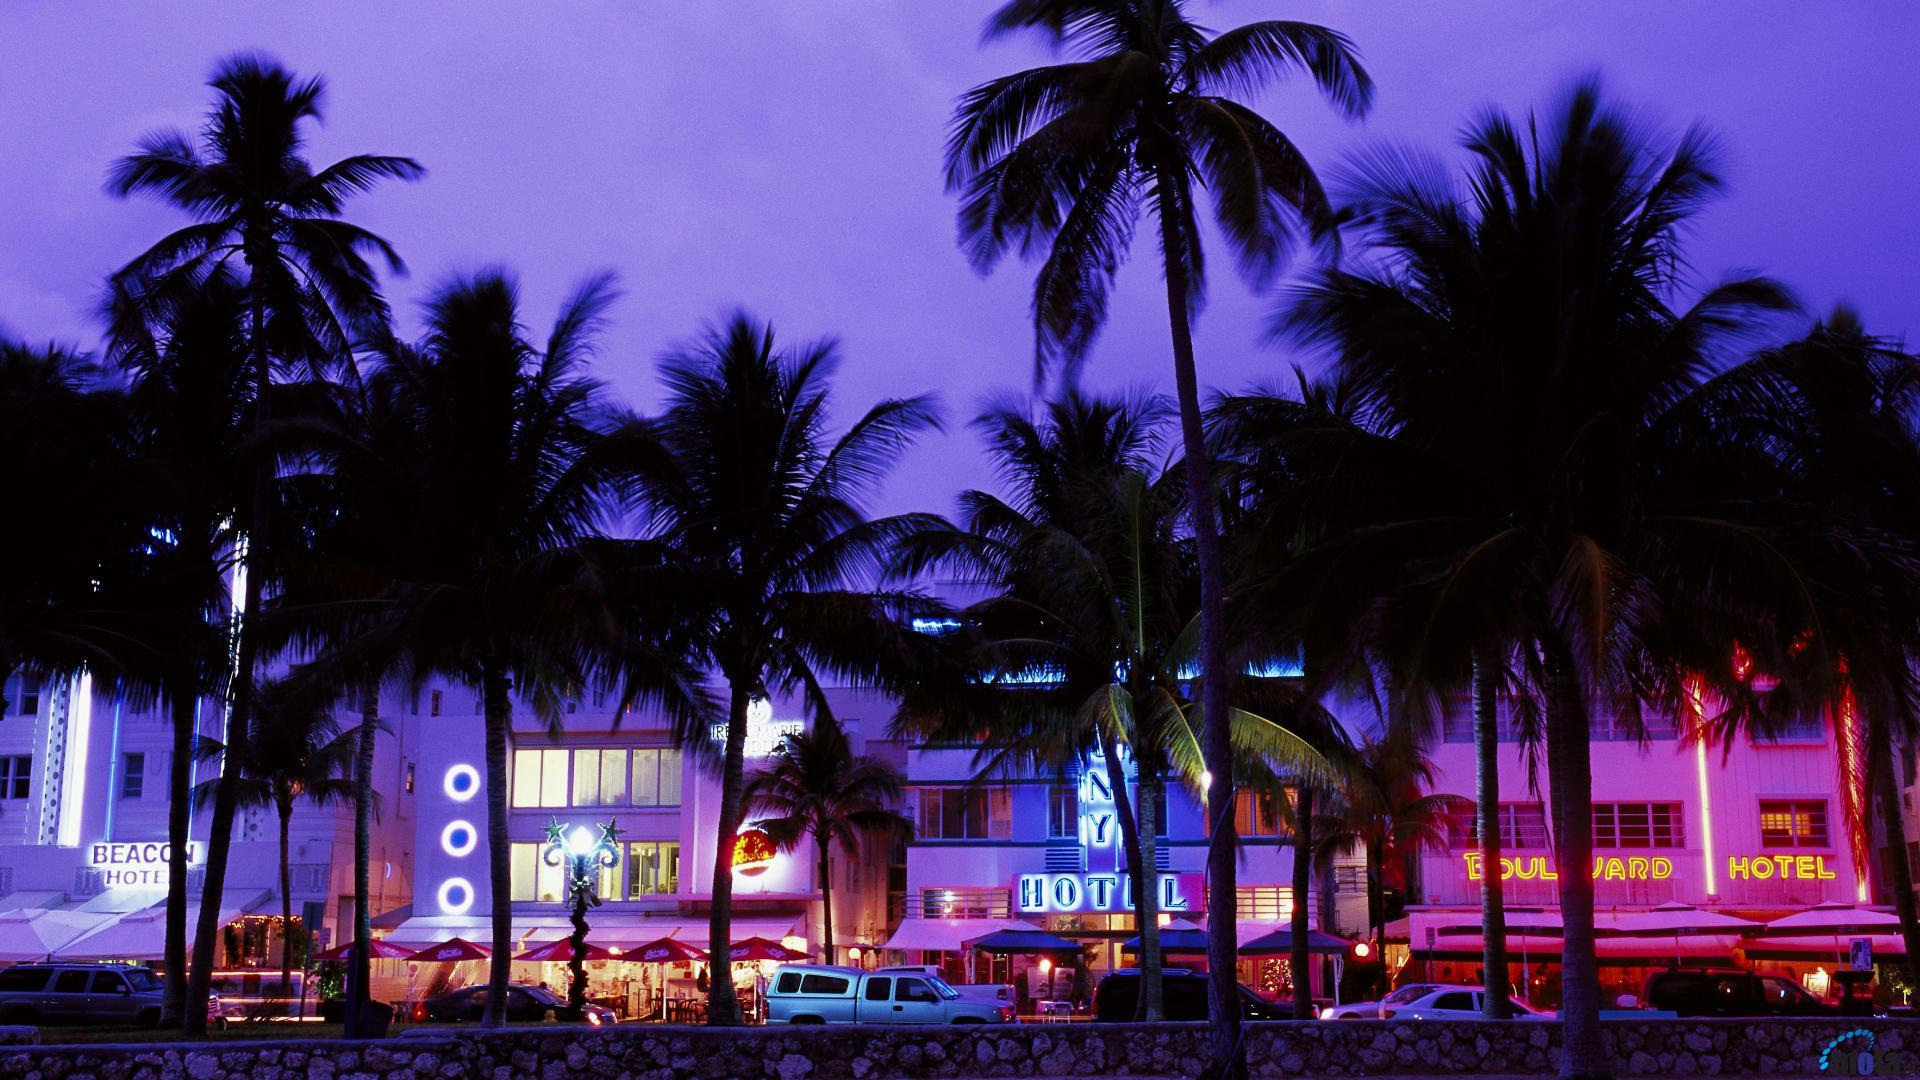 Desktop wallpapers Art Deco District South Beach Miami Beach 1920x1080